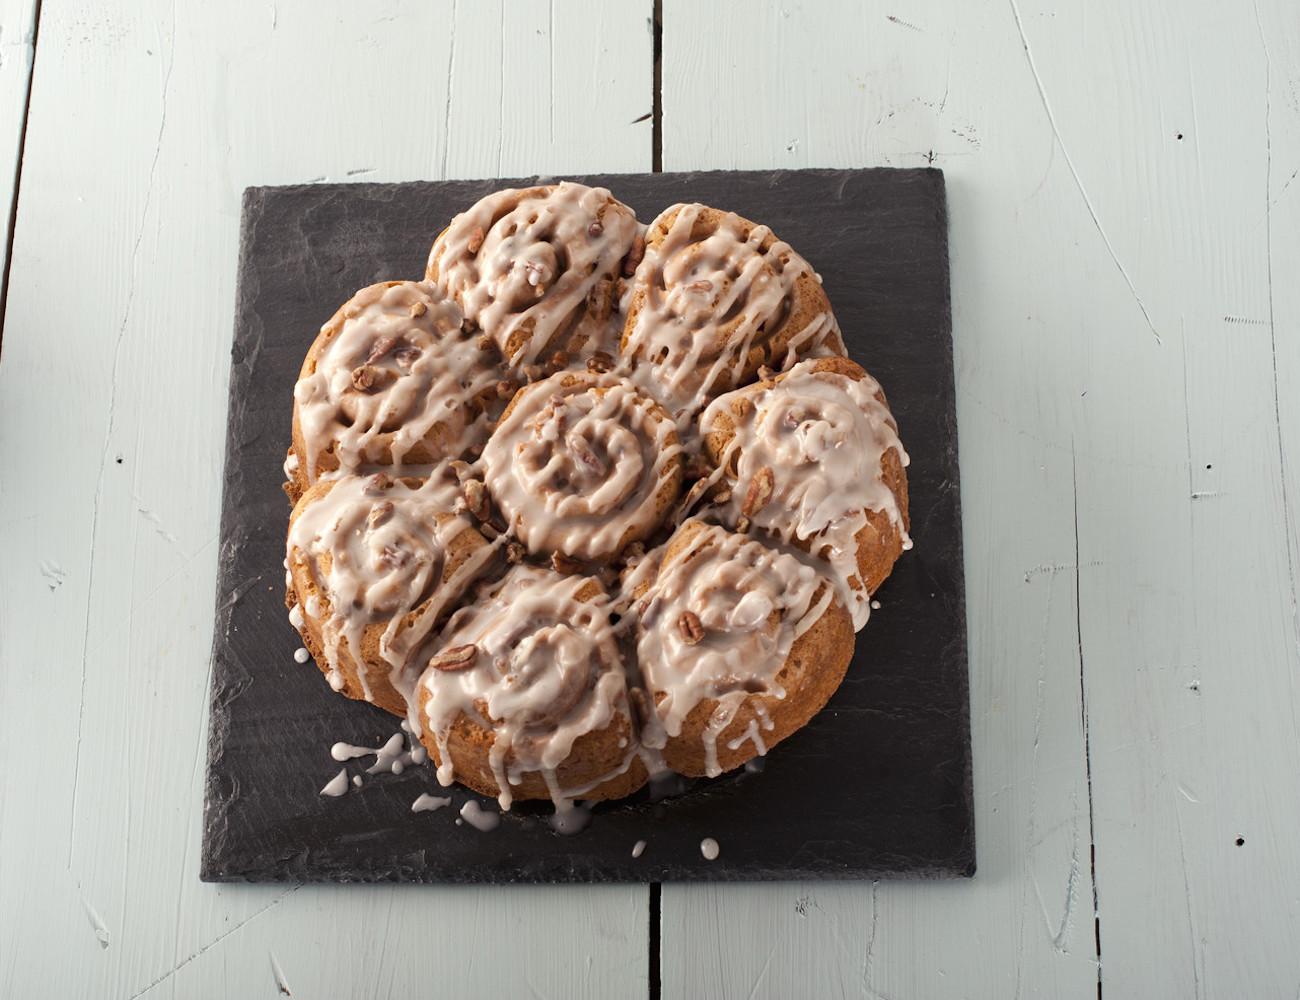 cinnamon-bun-pan-by-nordic-ware-03